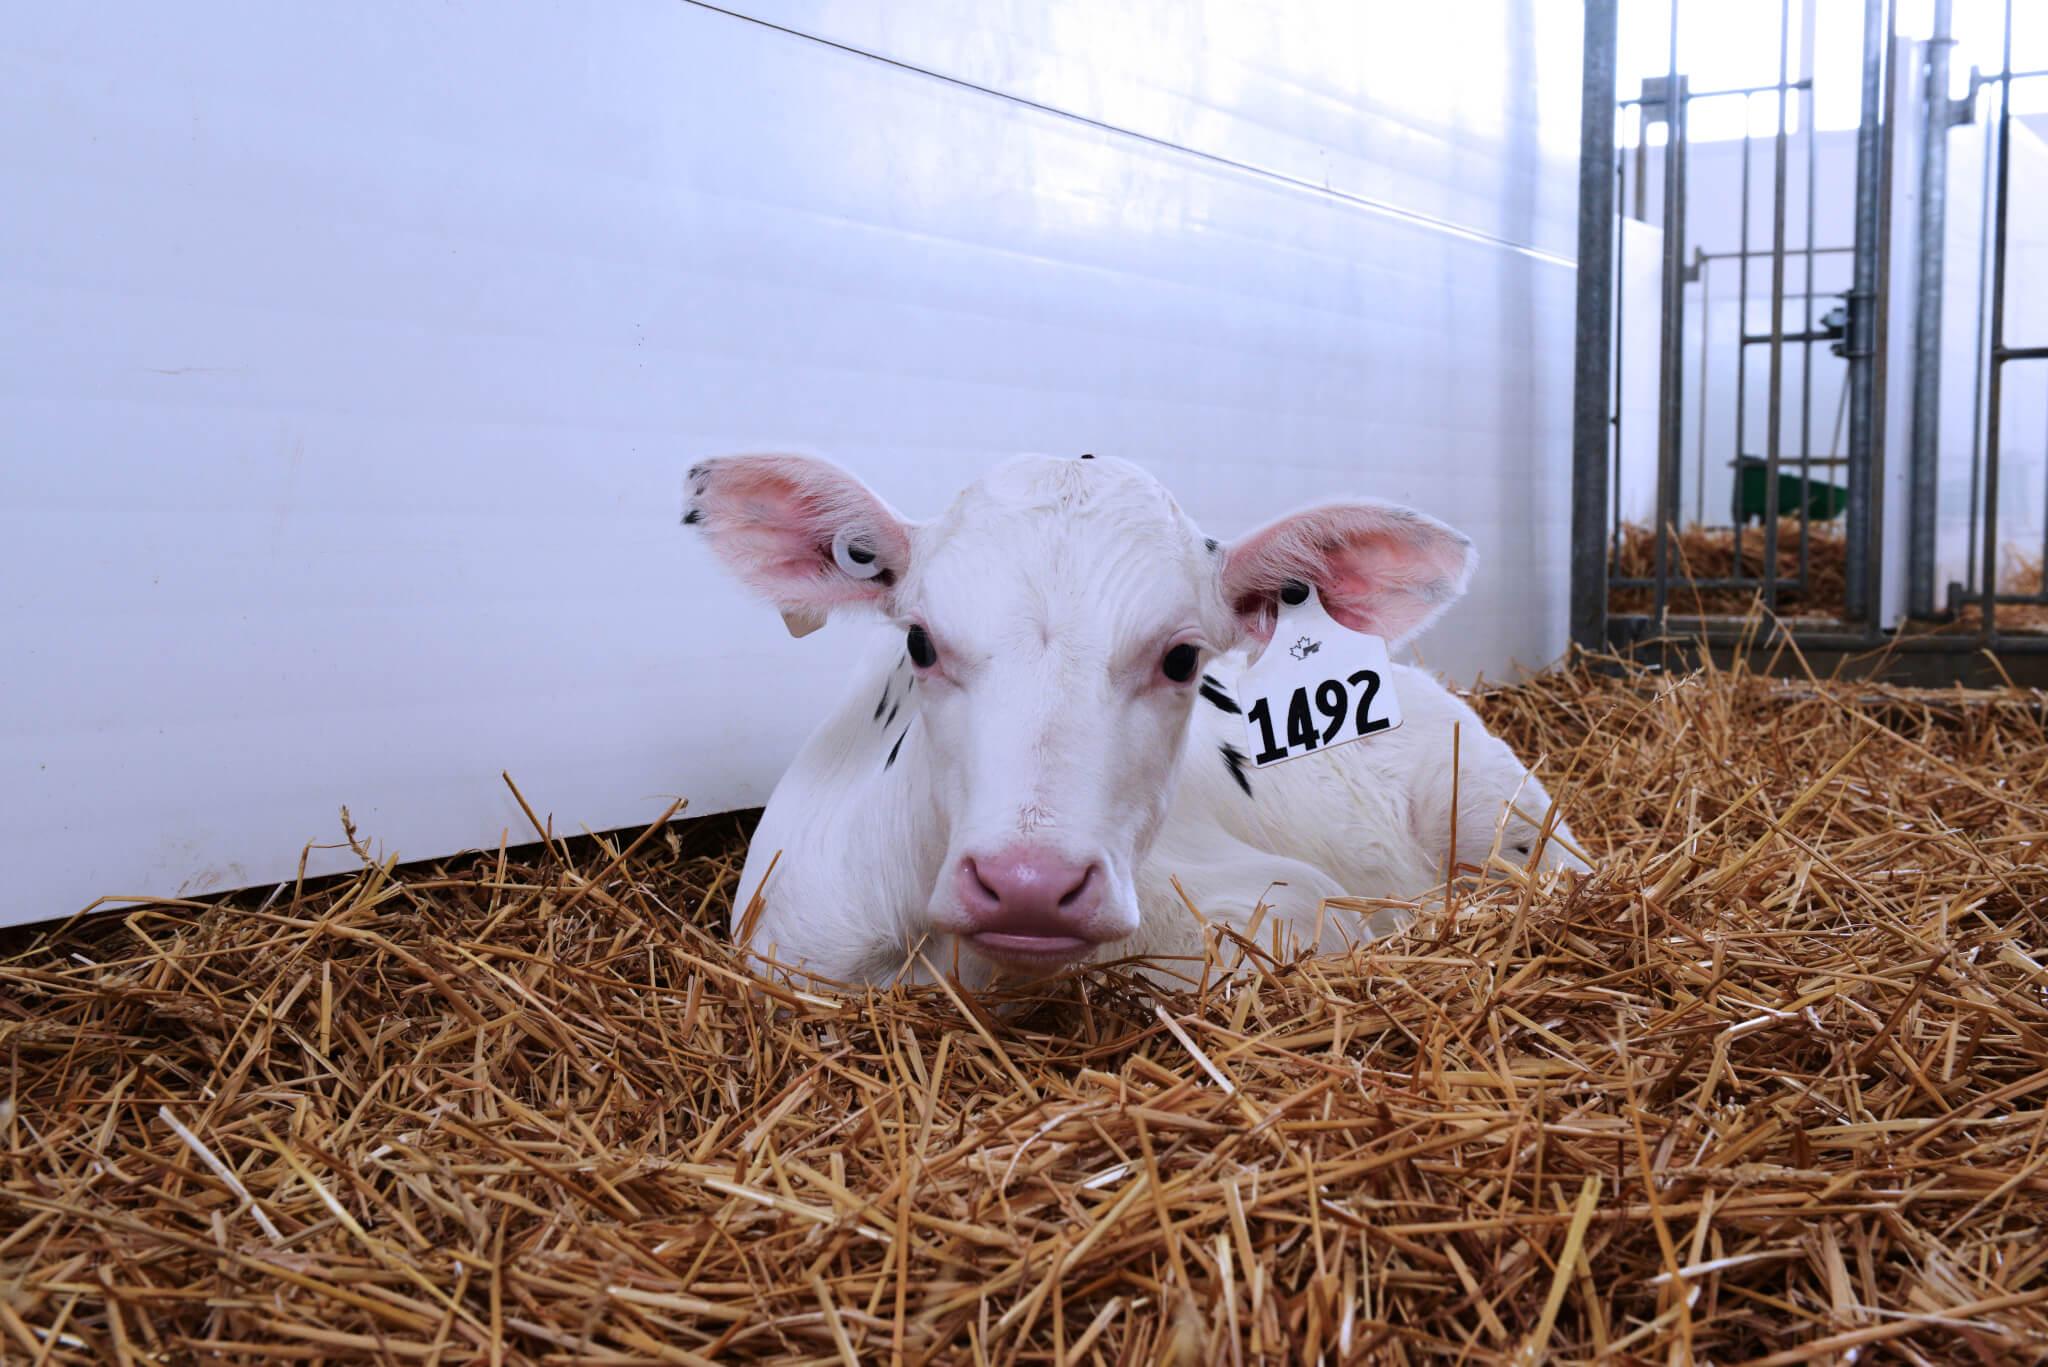 Achieve 24/22 milk replacer, calf lying in pen of straw